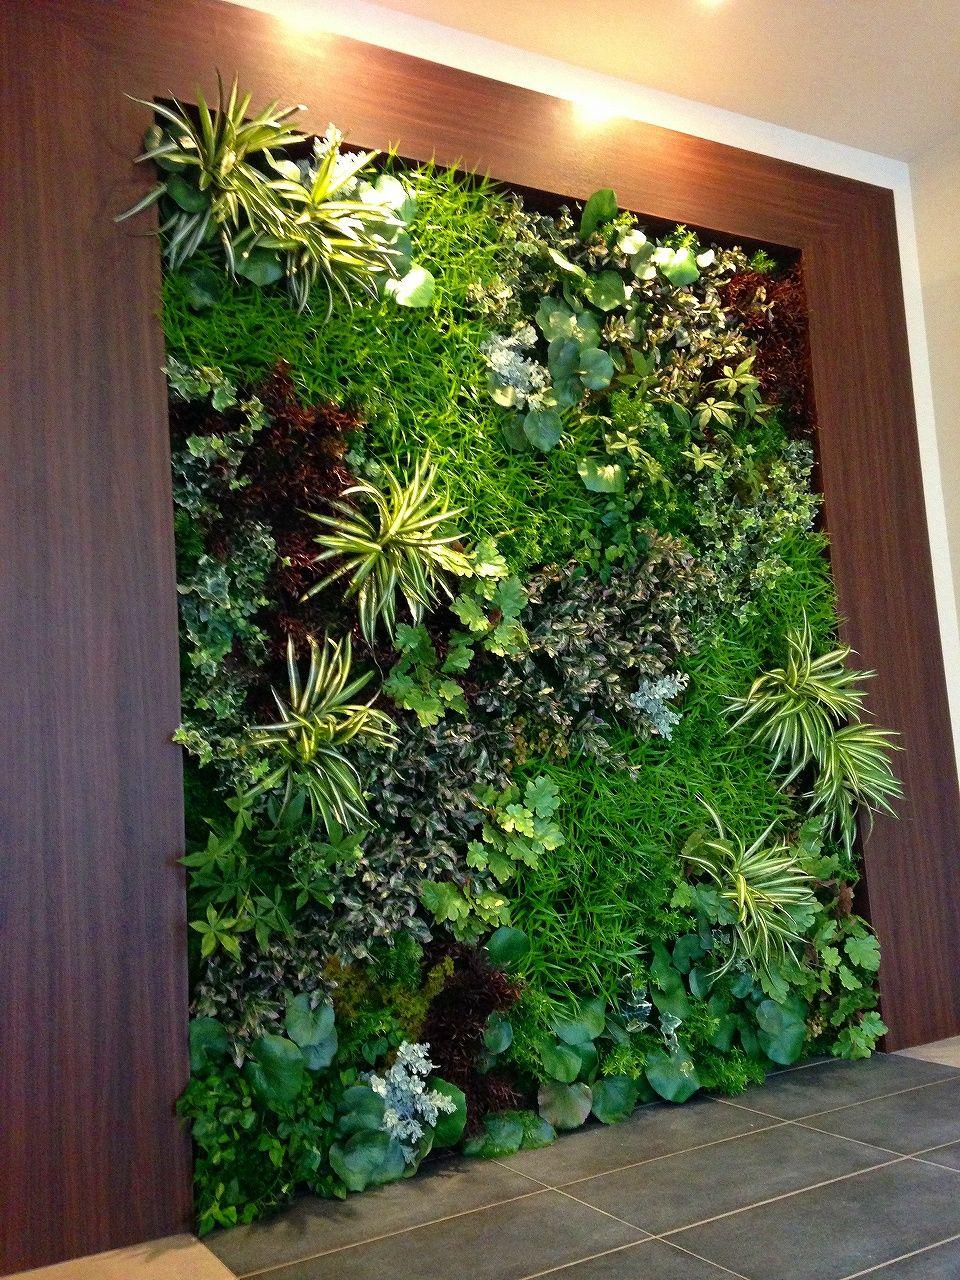 Artificial Flower Wall Display 植物栽培 ウォールガーデン ウォールグリーン 400 x 300